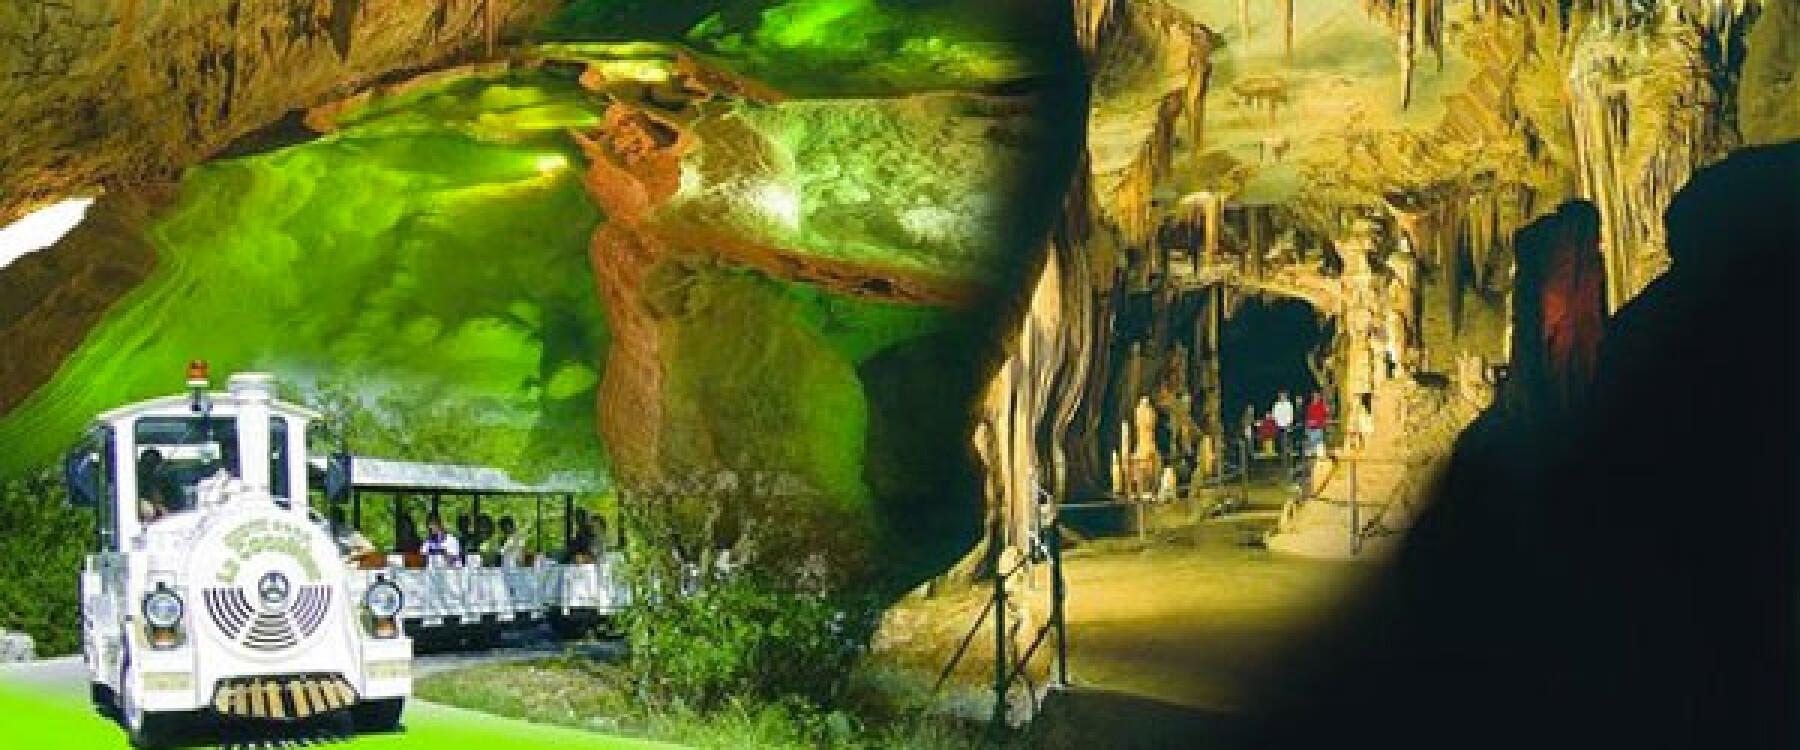 GrotteCocaliere600x250